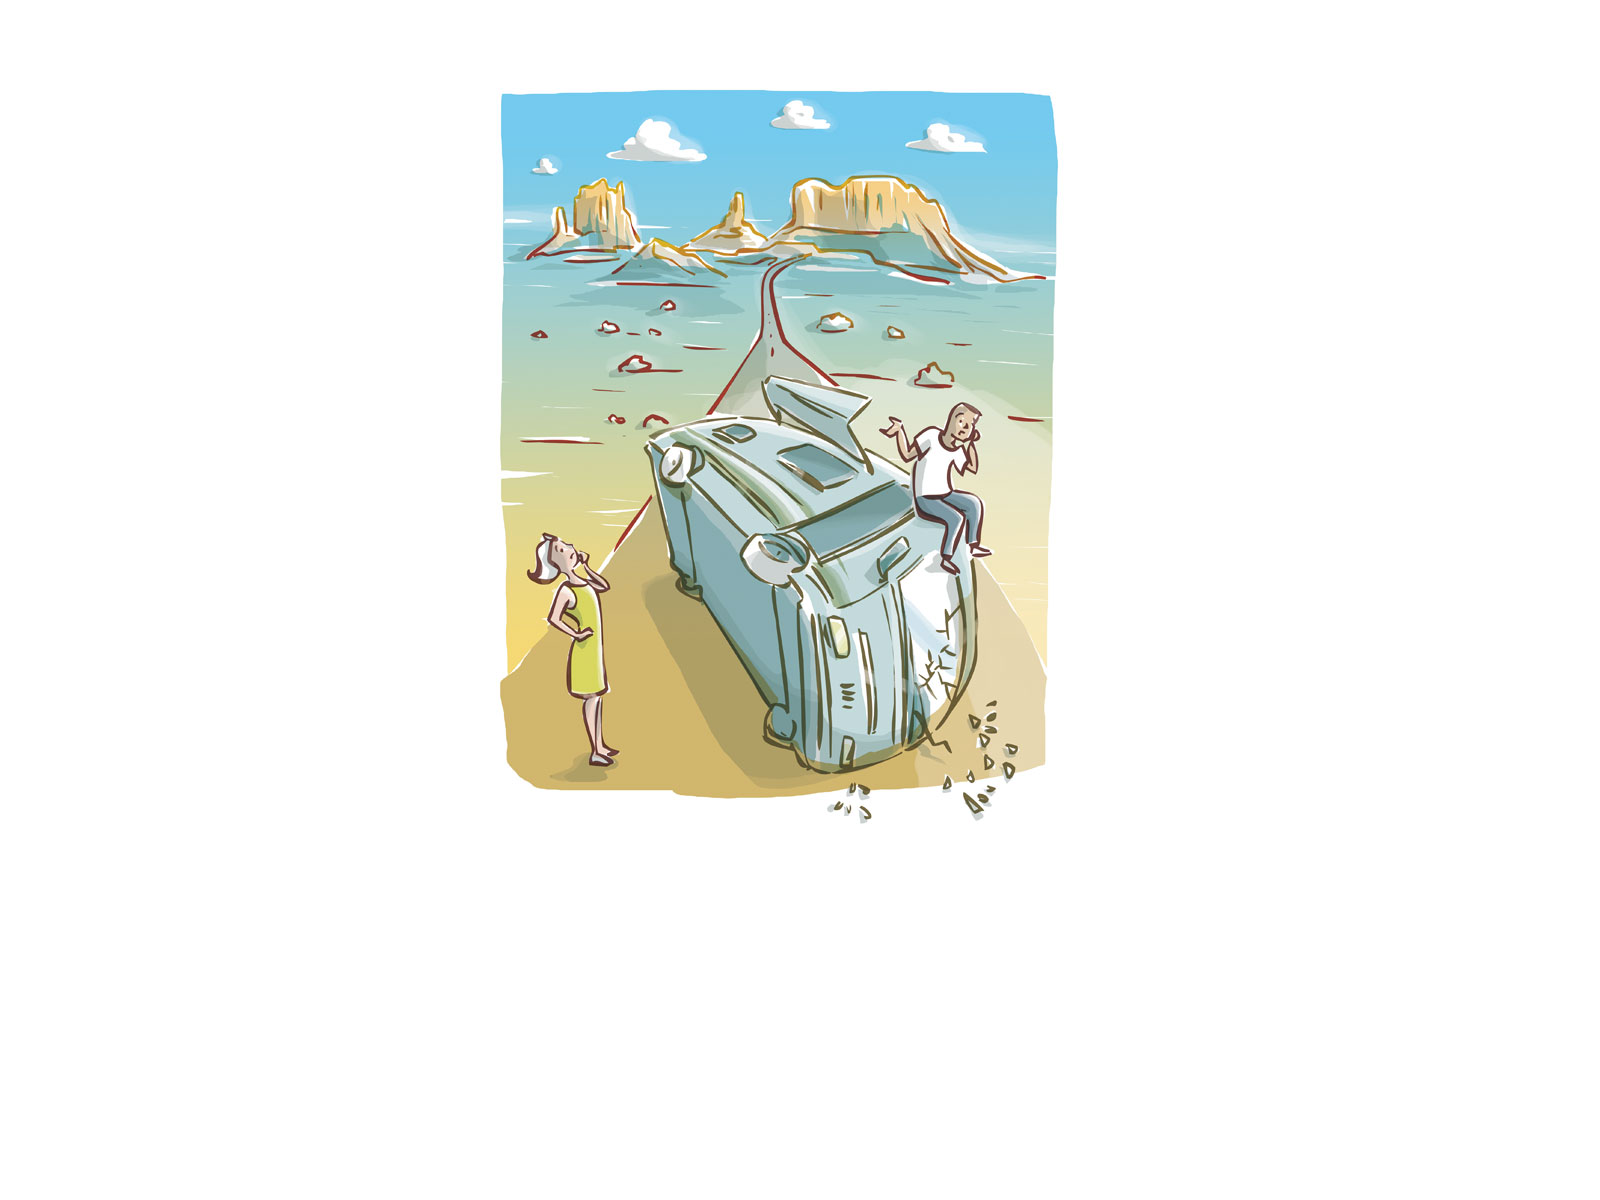 illustrations-beatricefavereau-4198